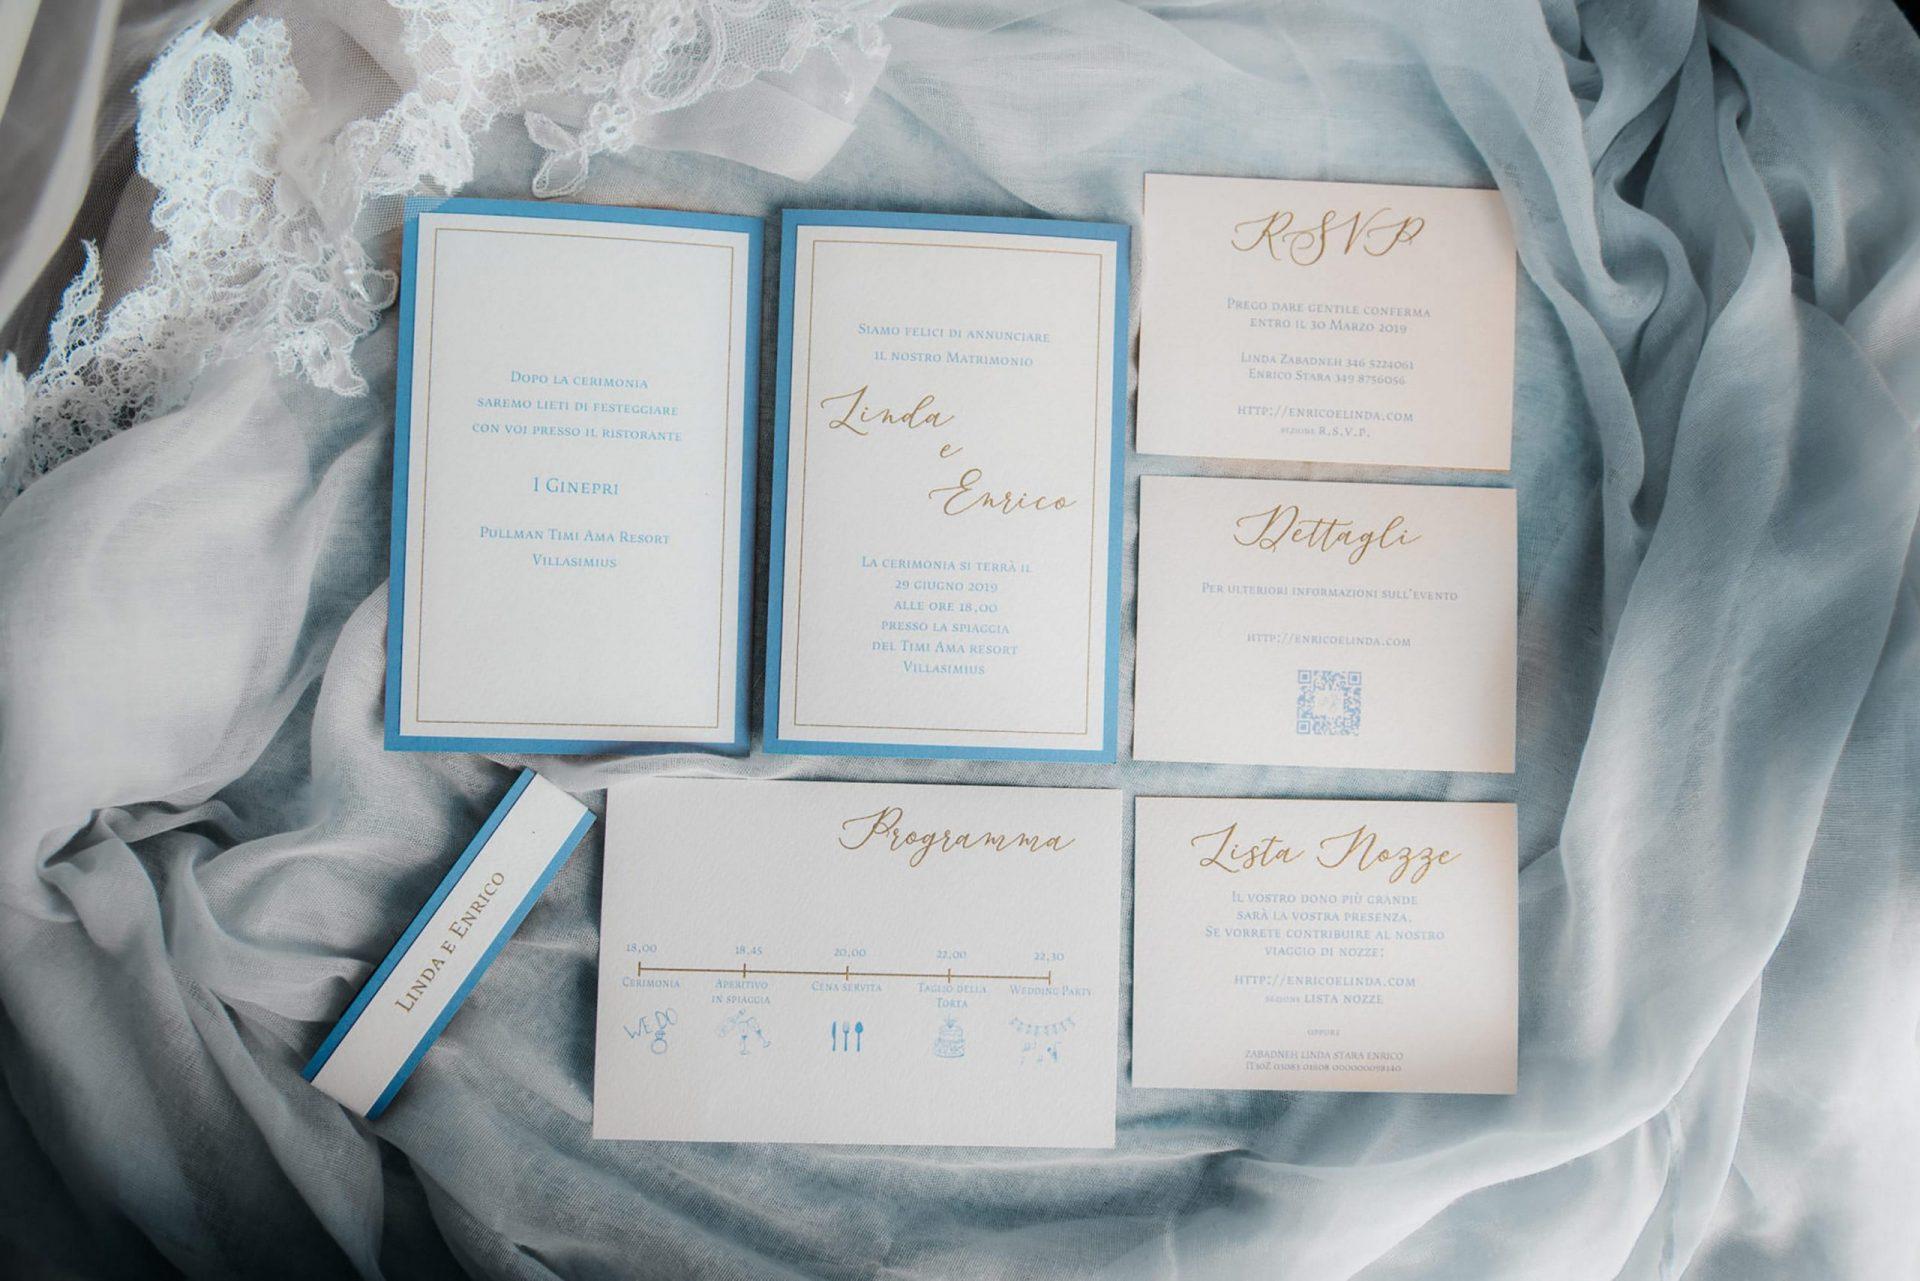 Linda and Enrico, wedding stationery